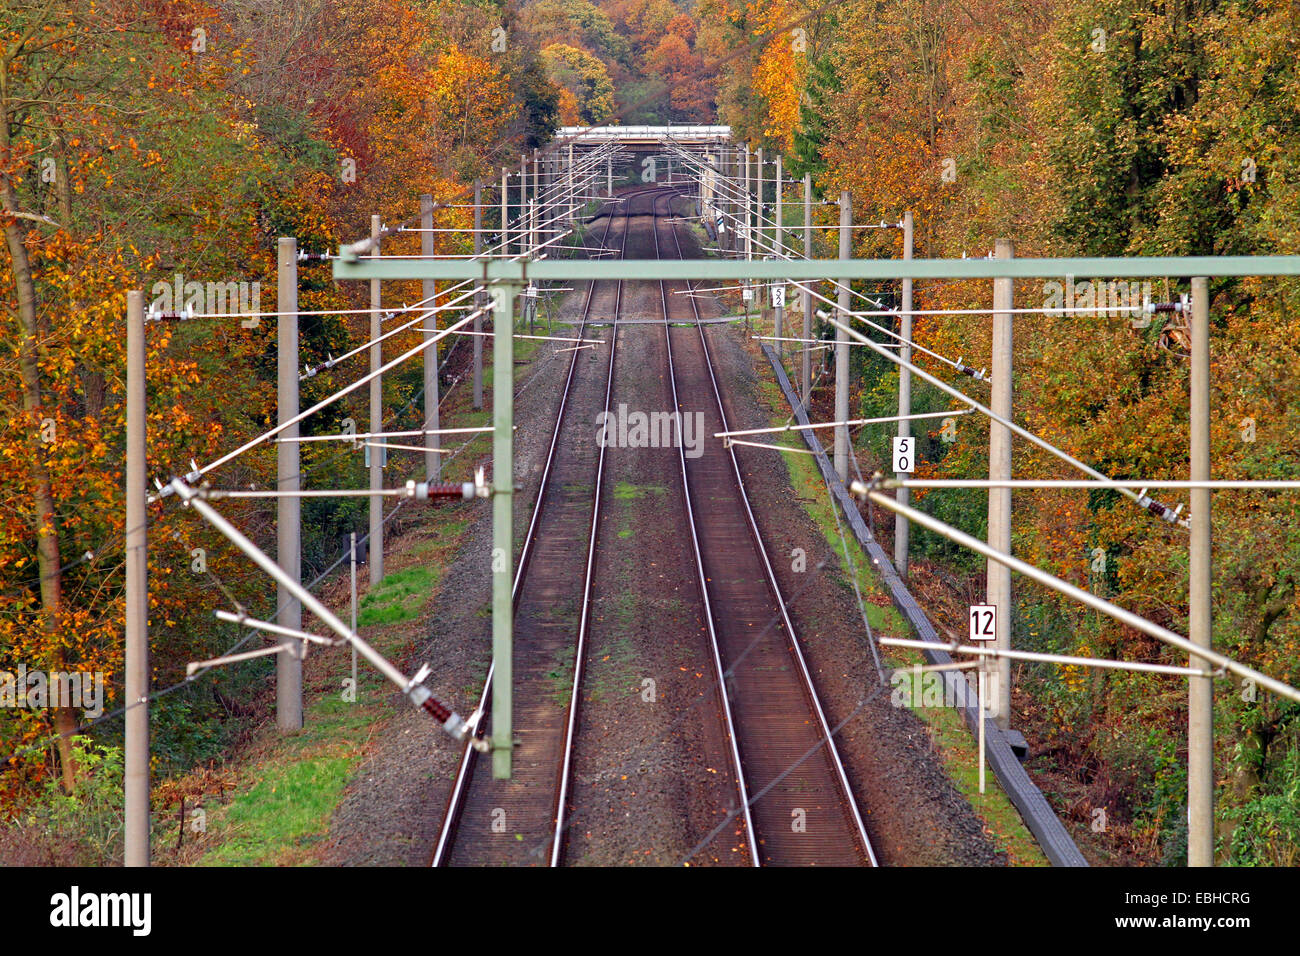 railtracks through autumn forest, Germany - Stock Image